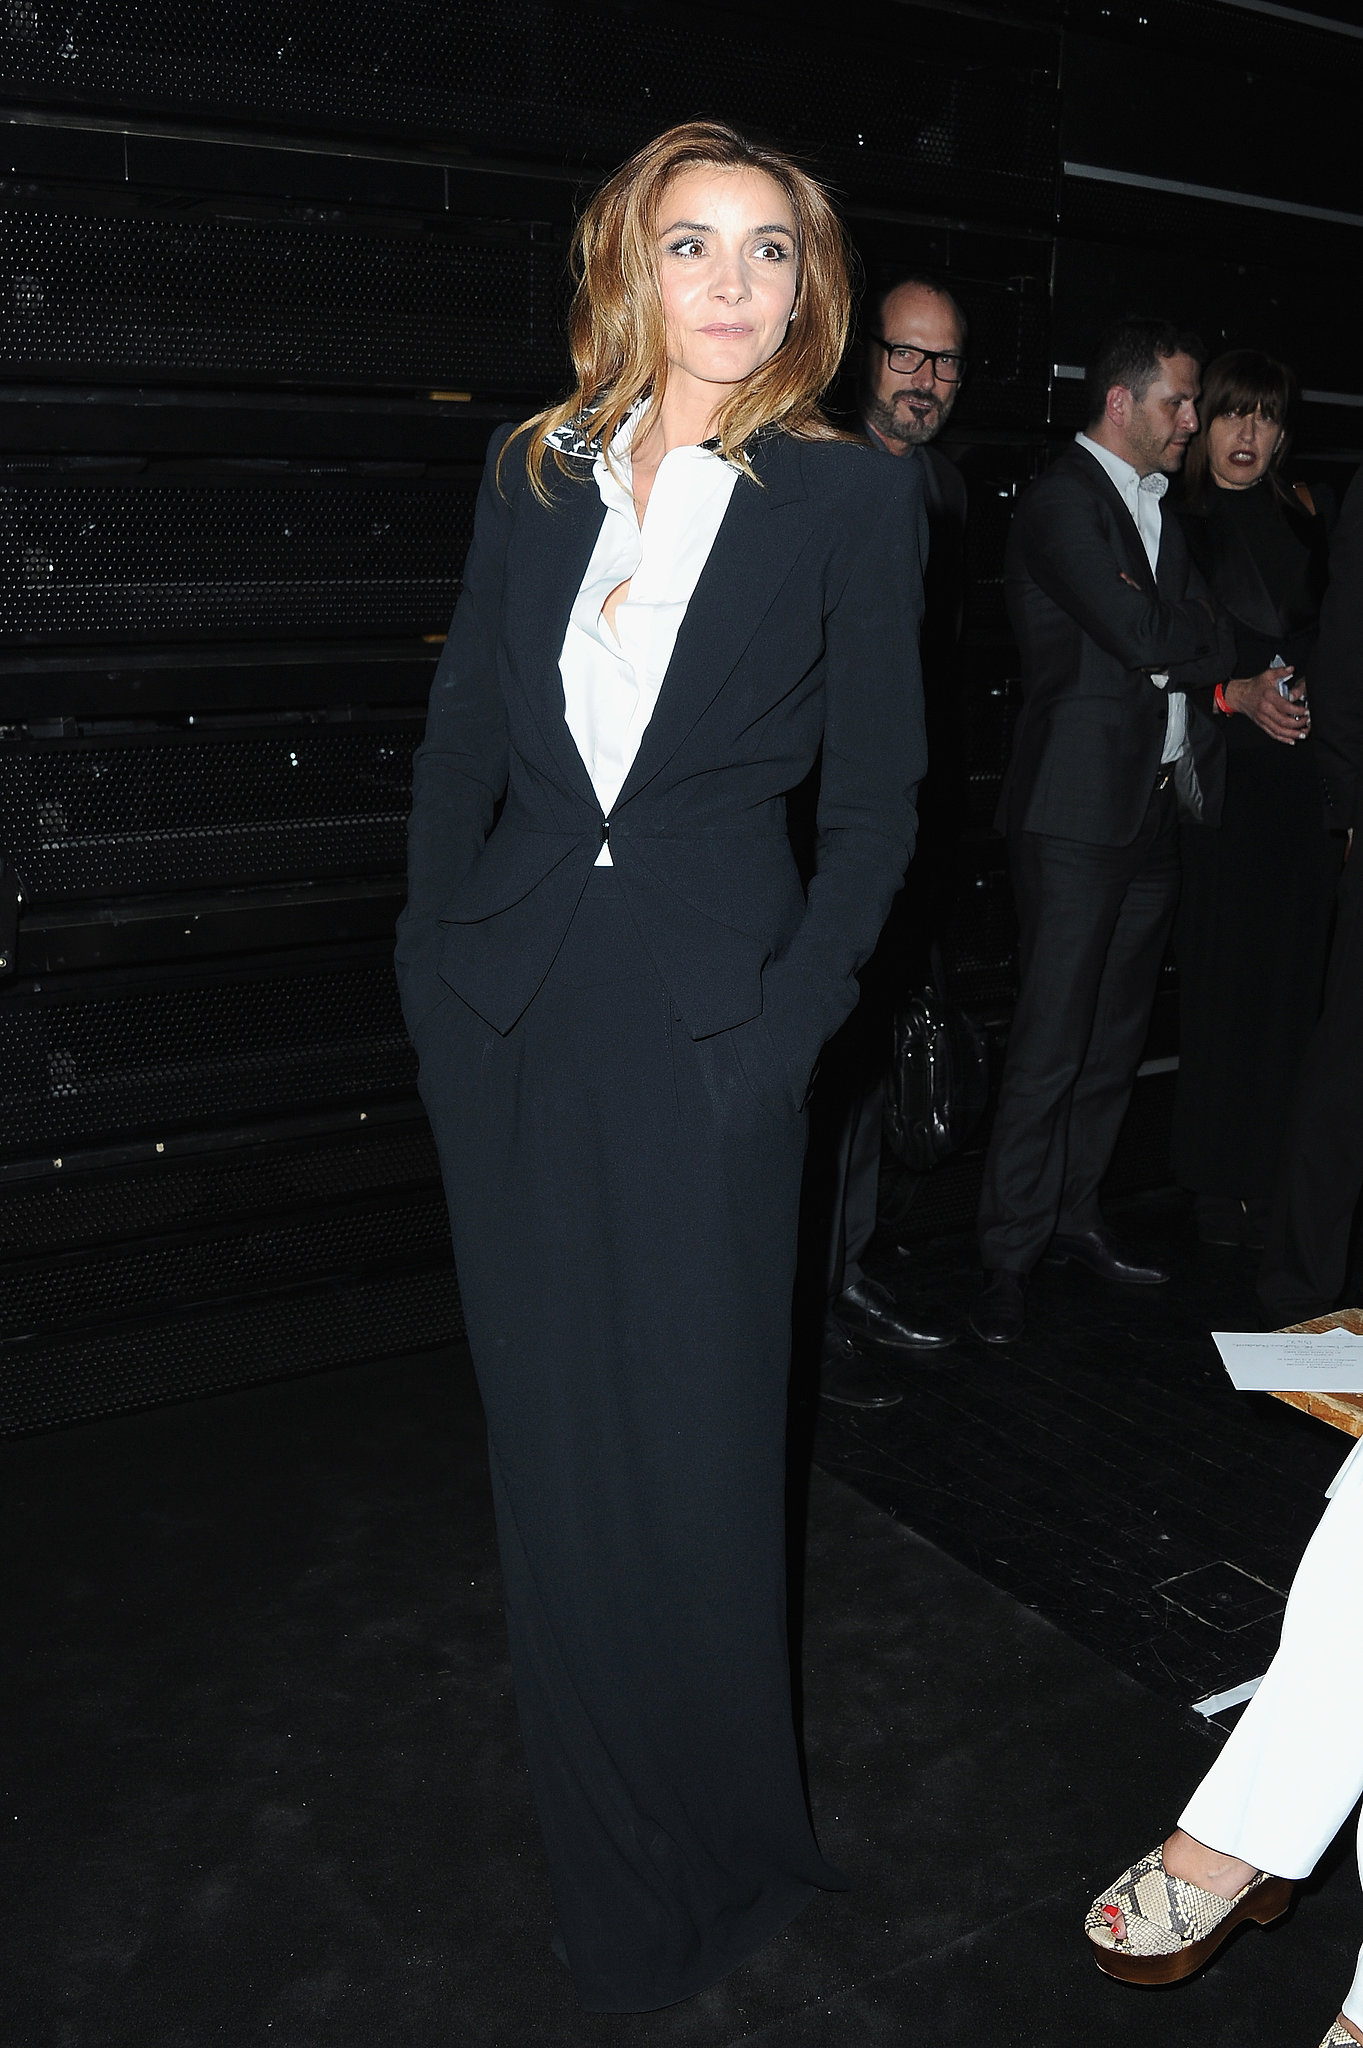 Clotilde Courau matched the black color palette at Viktor & Rolf's Haute Couture show.